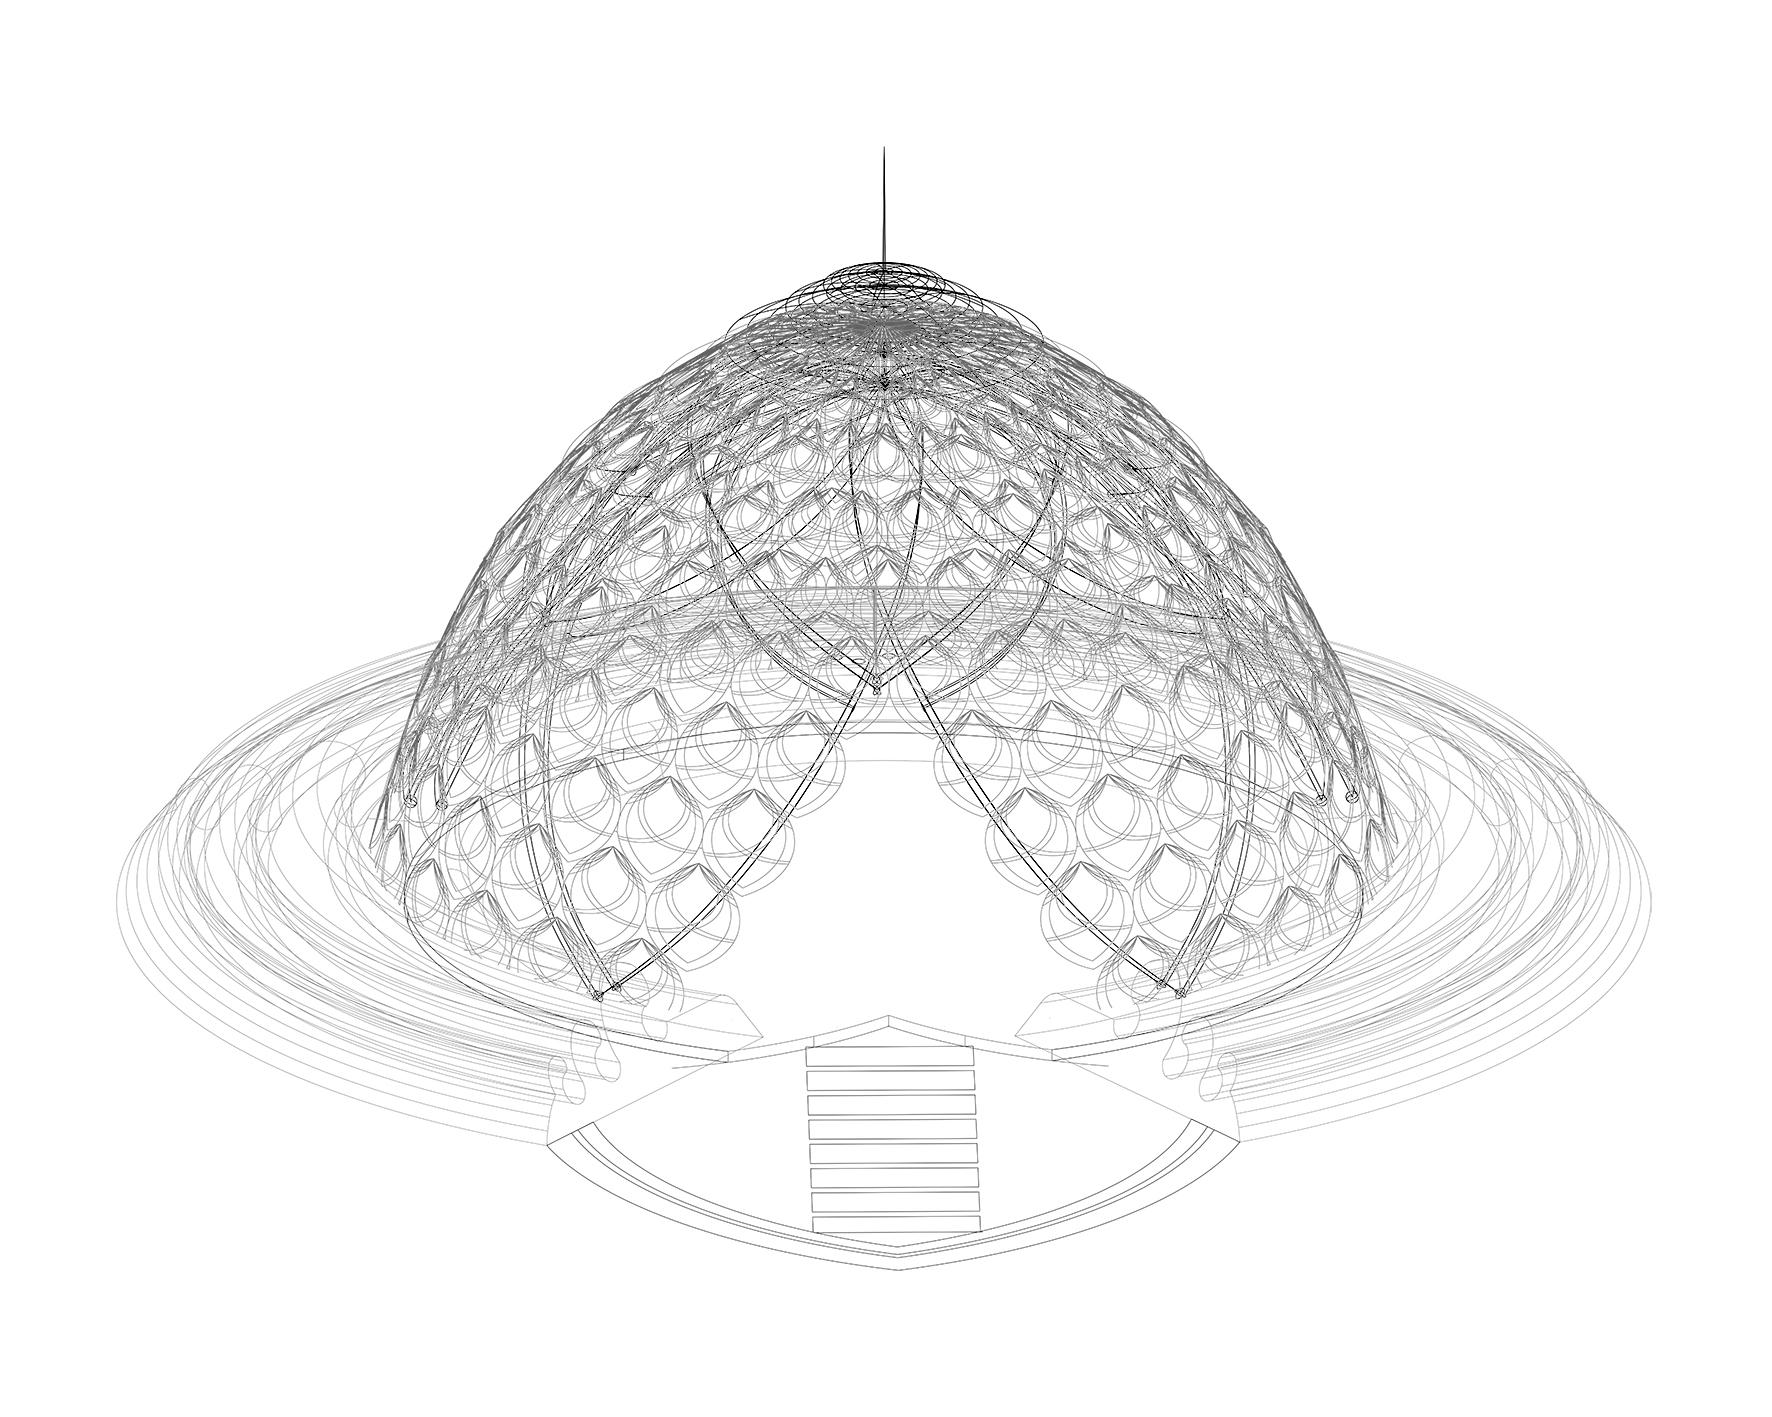 R&D lab new desing 3.3 RINO.cad 6 copy.jpg